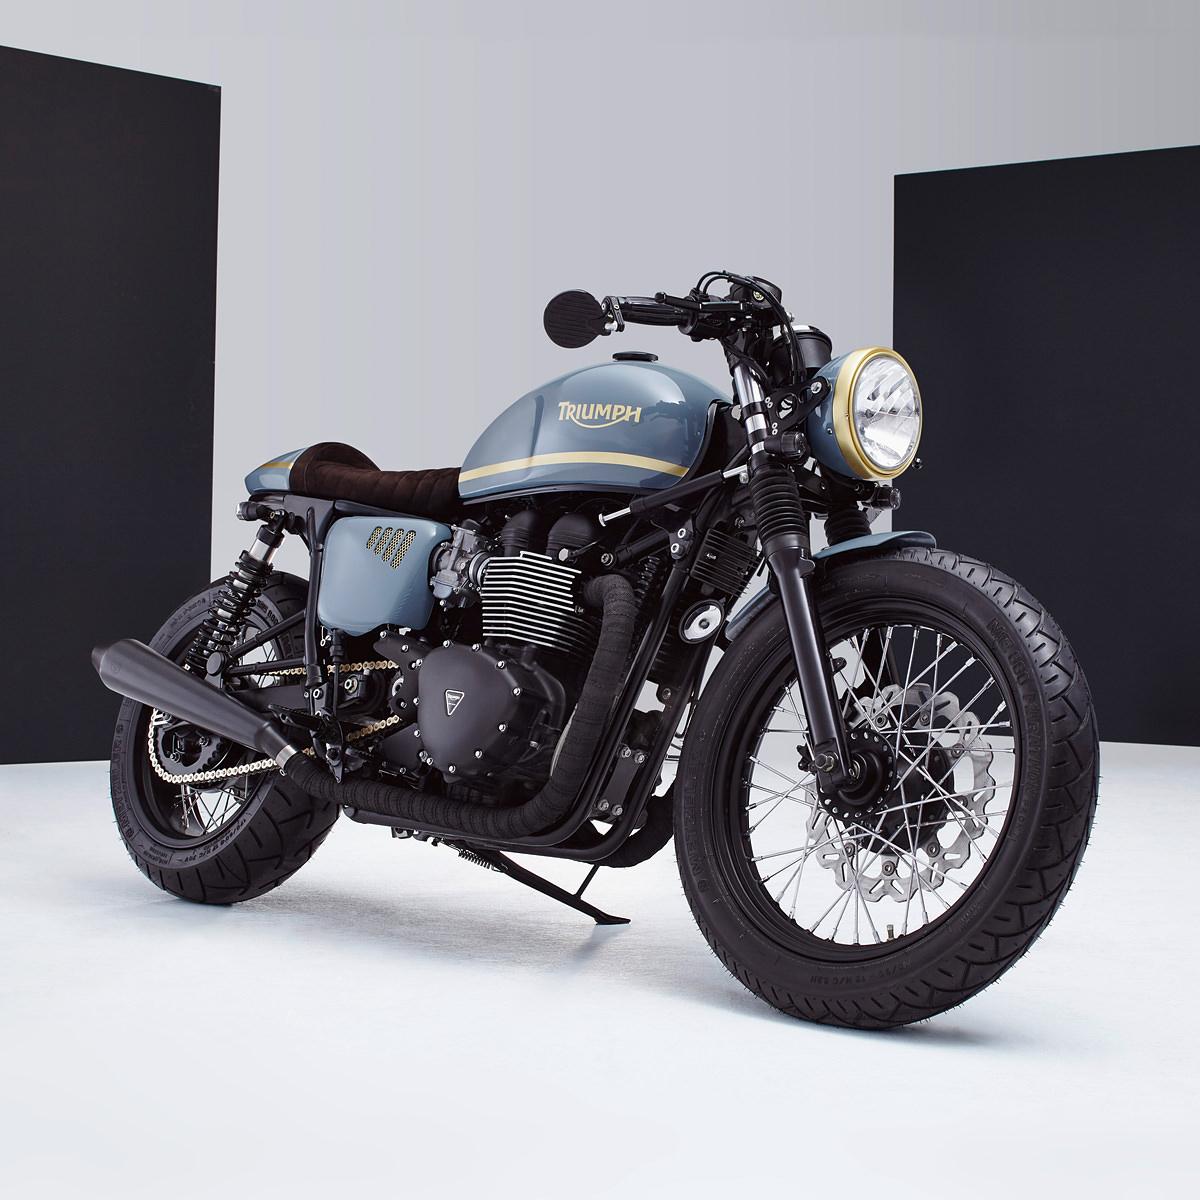 factory fresh: a bonneville custom from bunker | bike exif